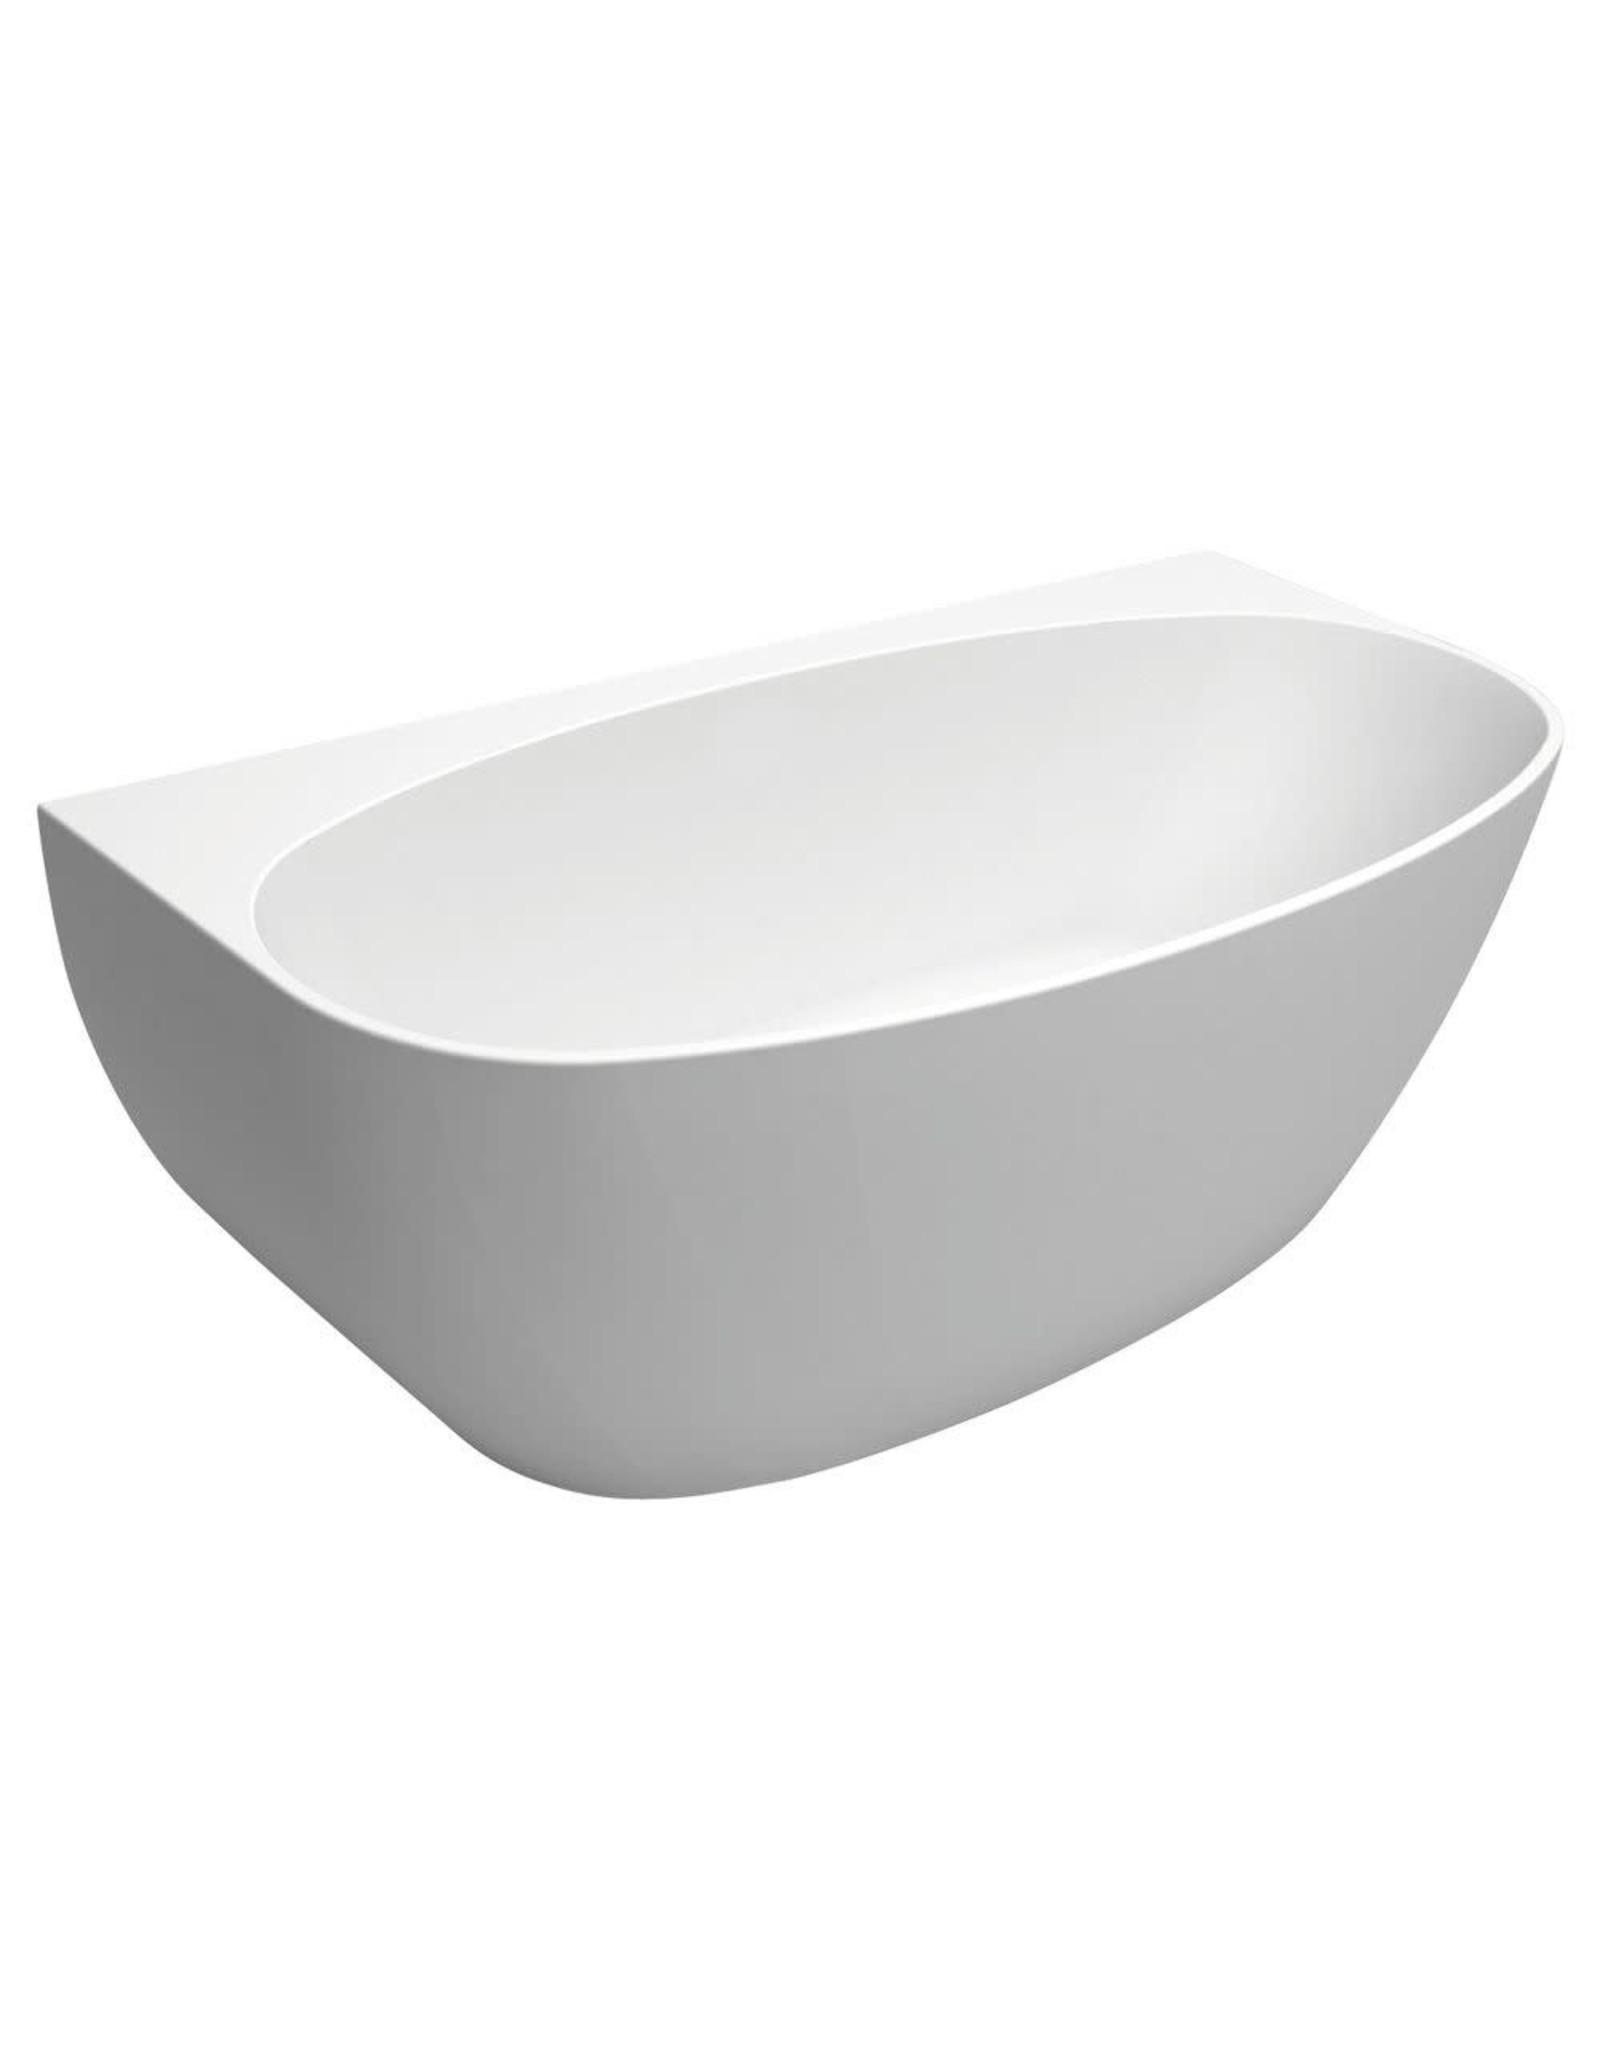 FIENZA 1700mm, FIENZA, KEETO Back-to-wall Acrylic Bath - INCLUDES CHROME WASTE